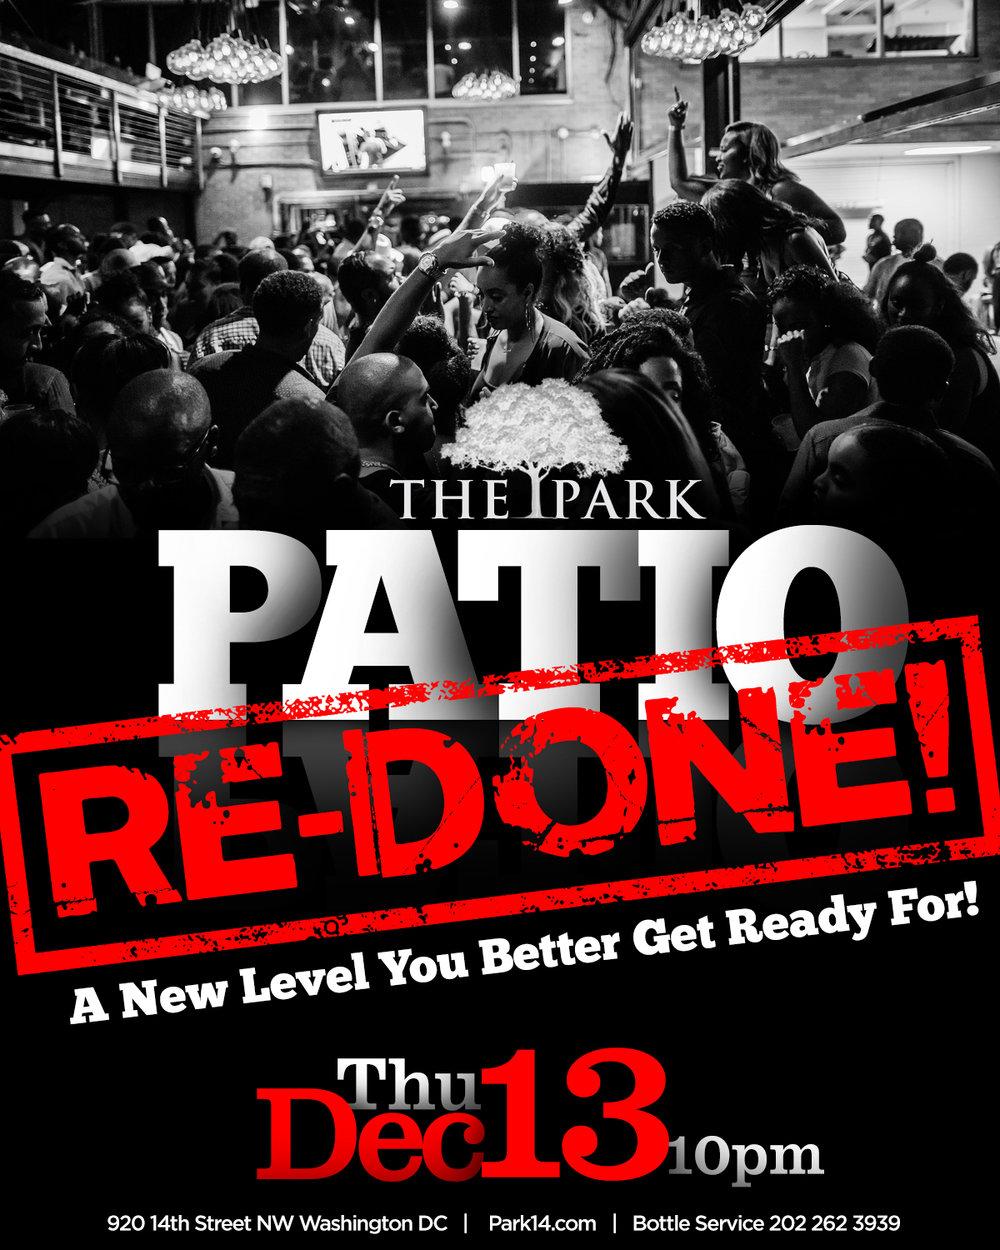 Patio REDONE Flyer.jpg